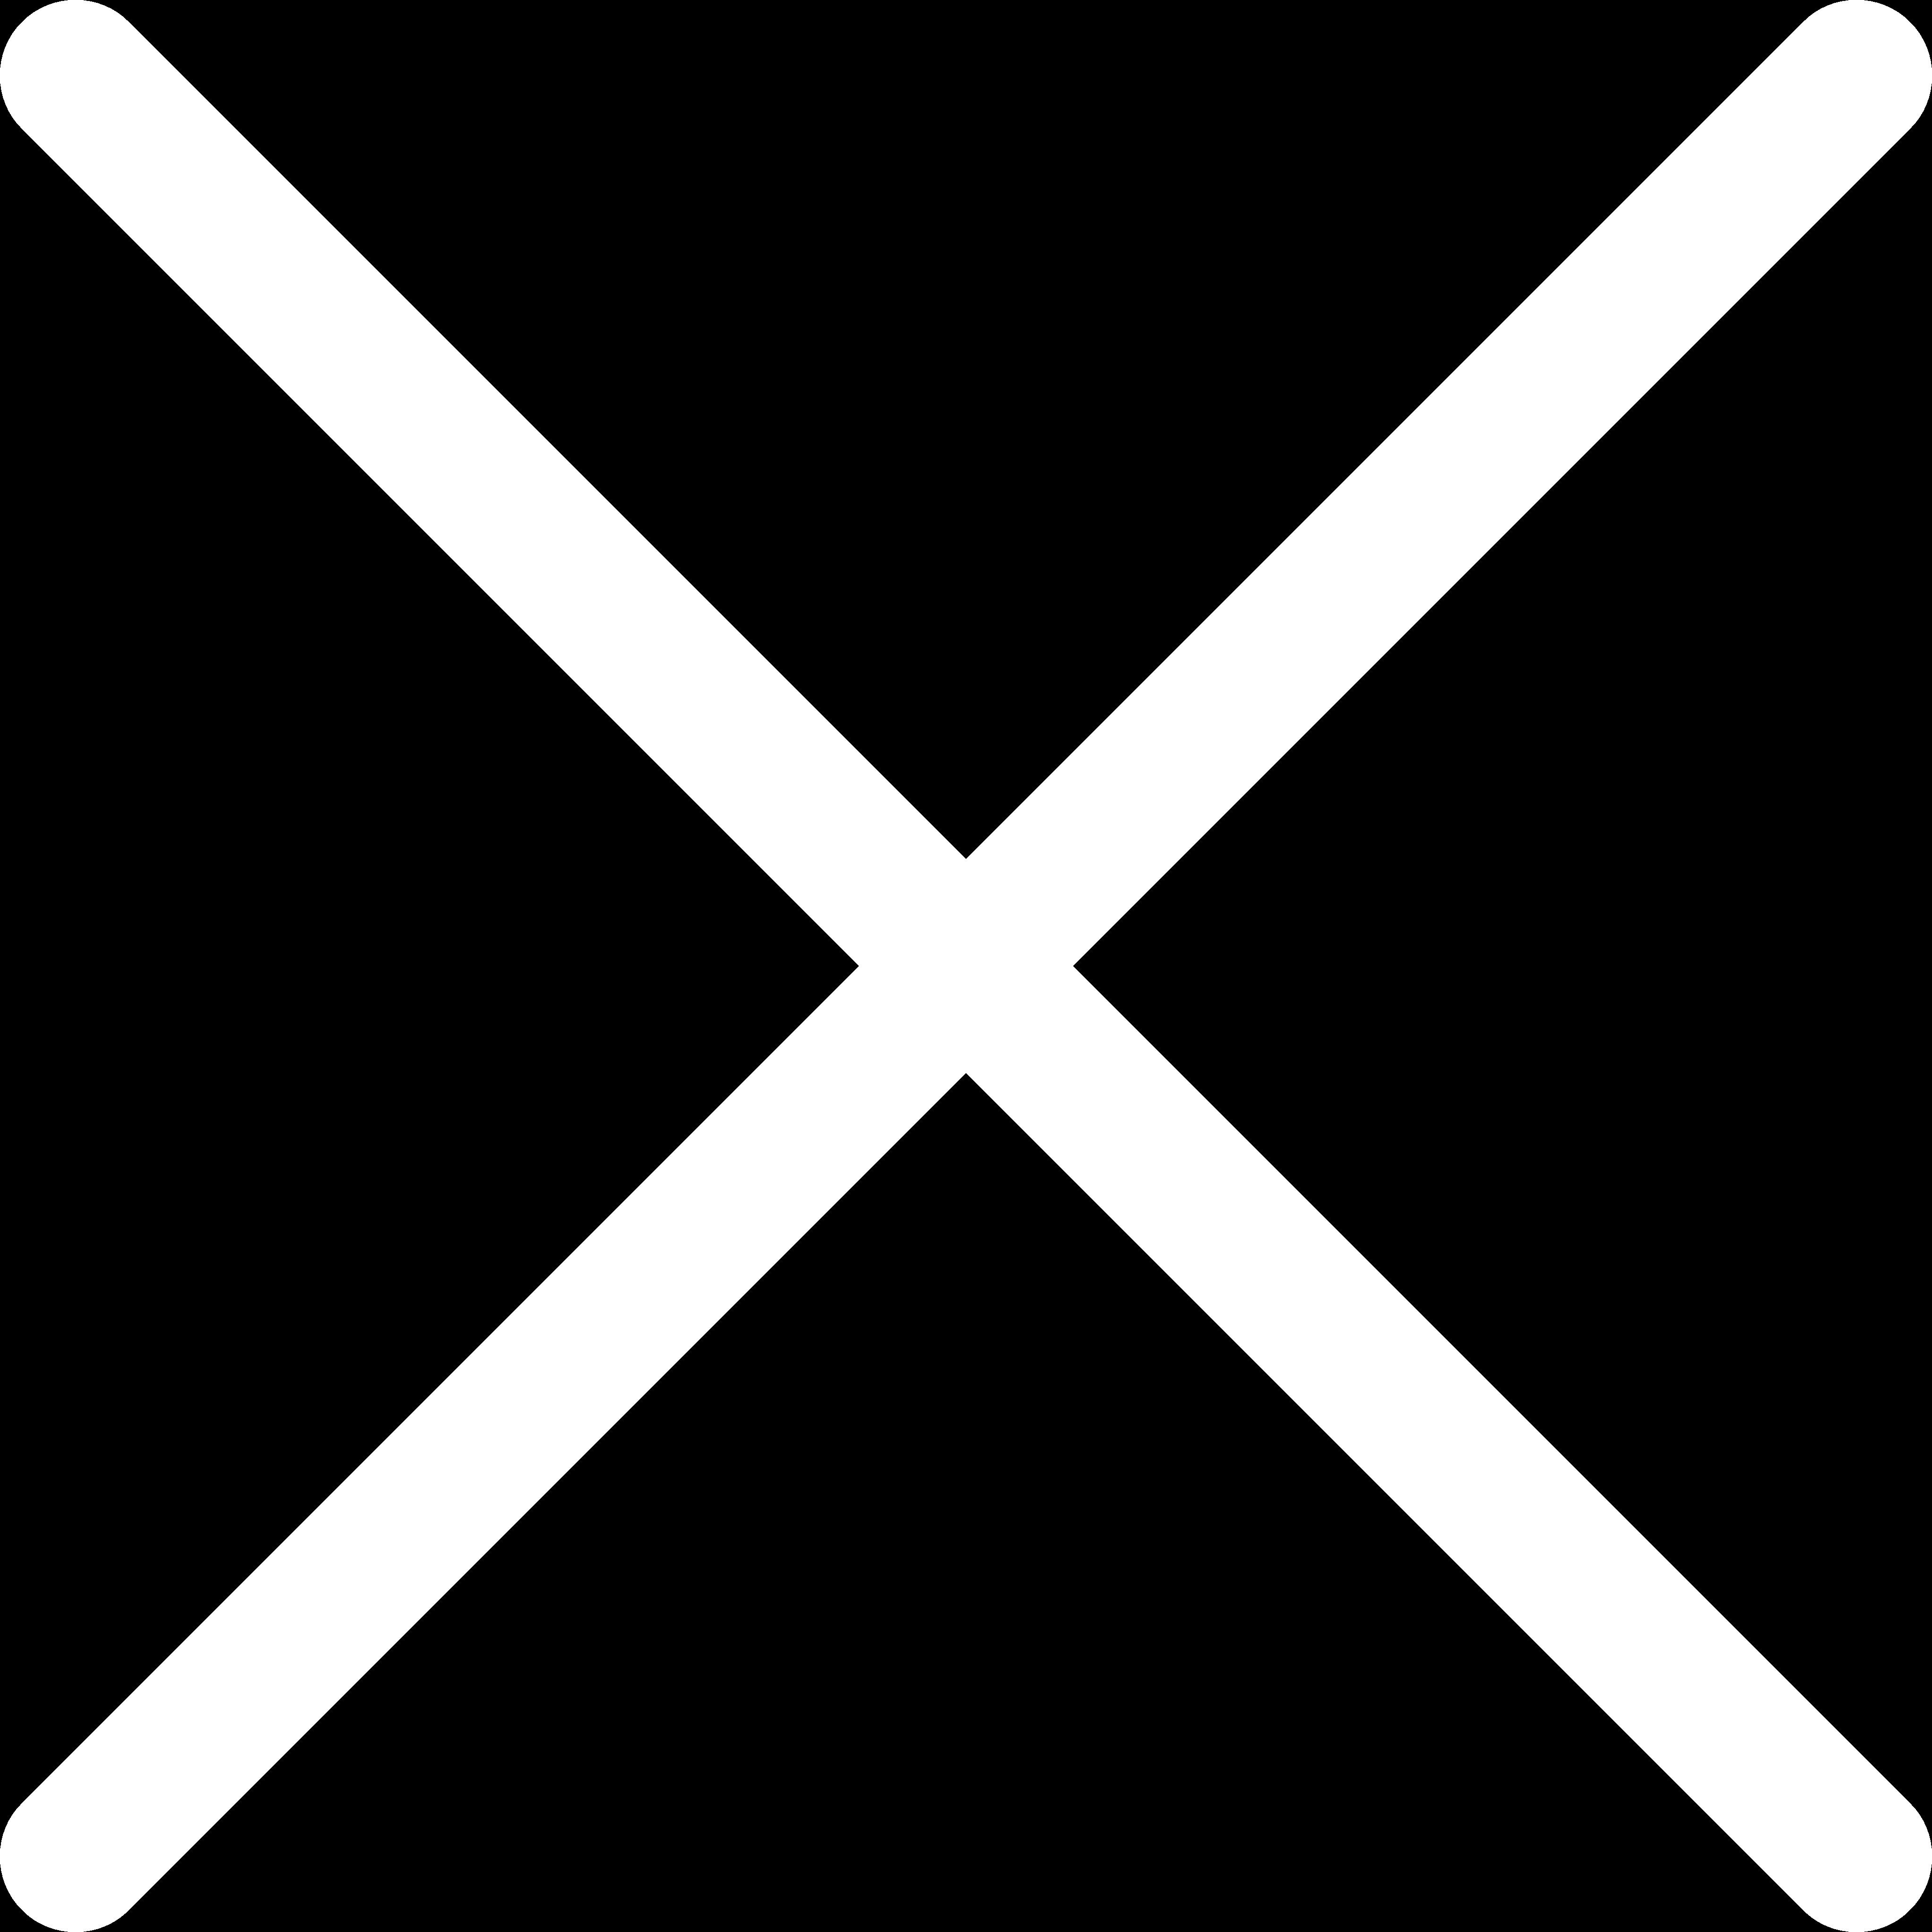 closed-icon